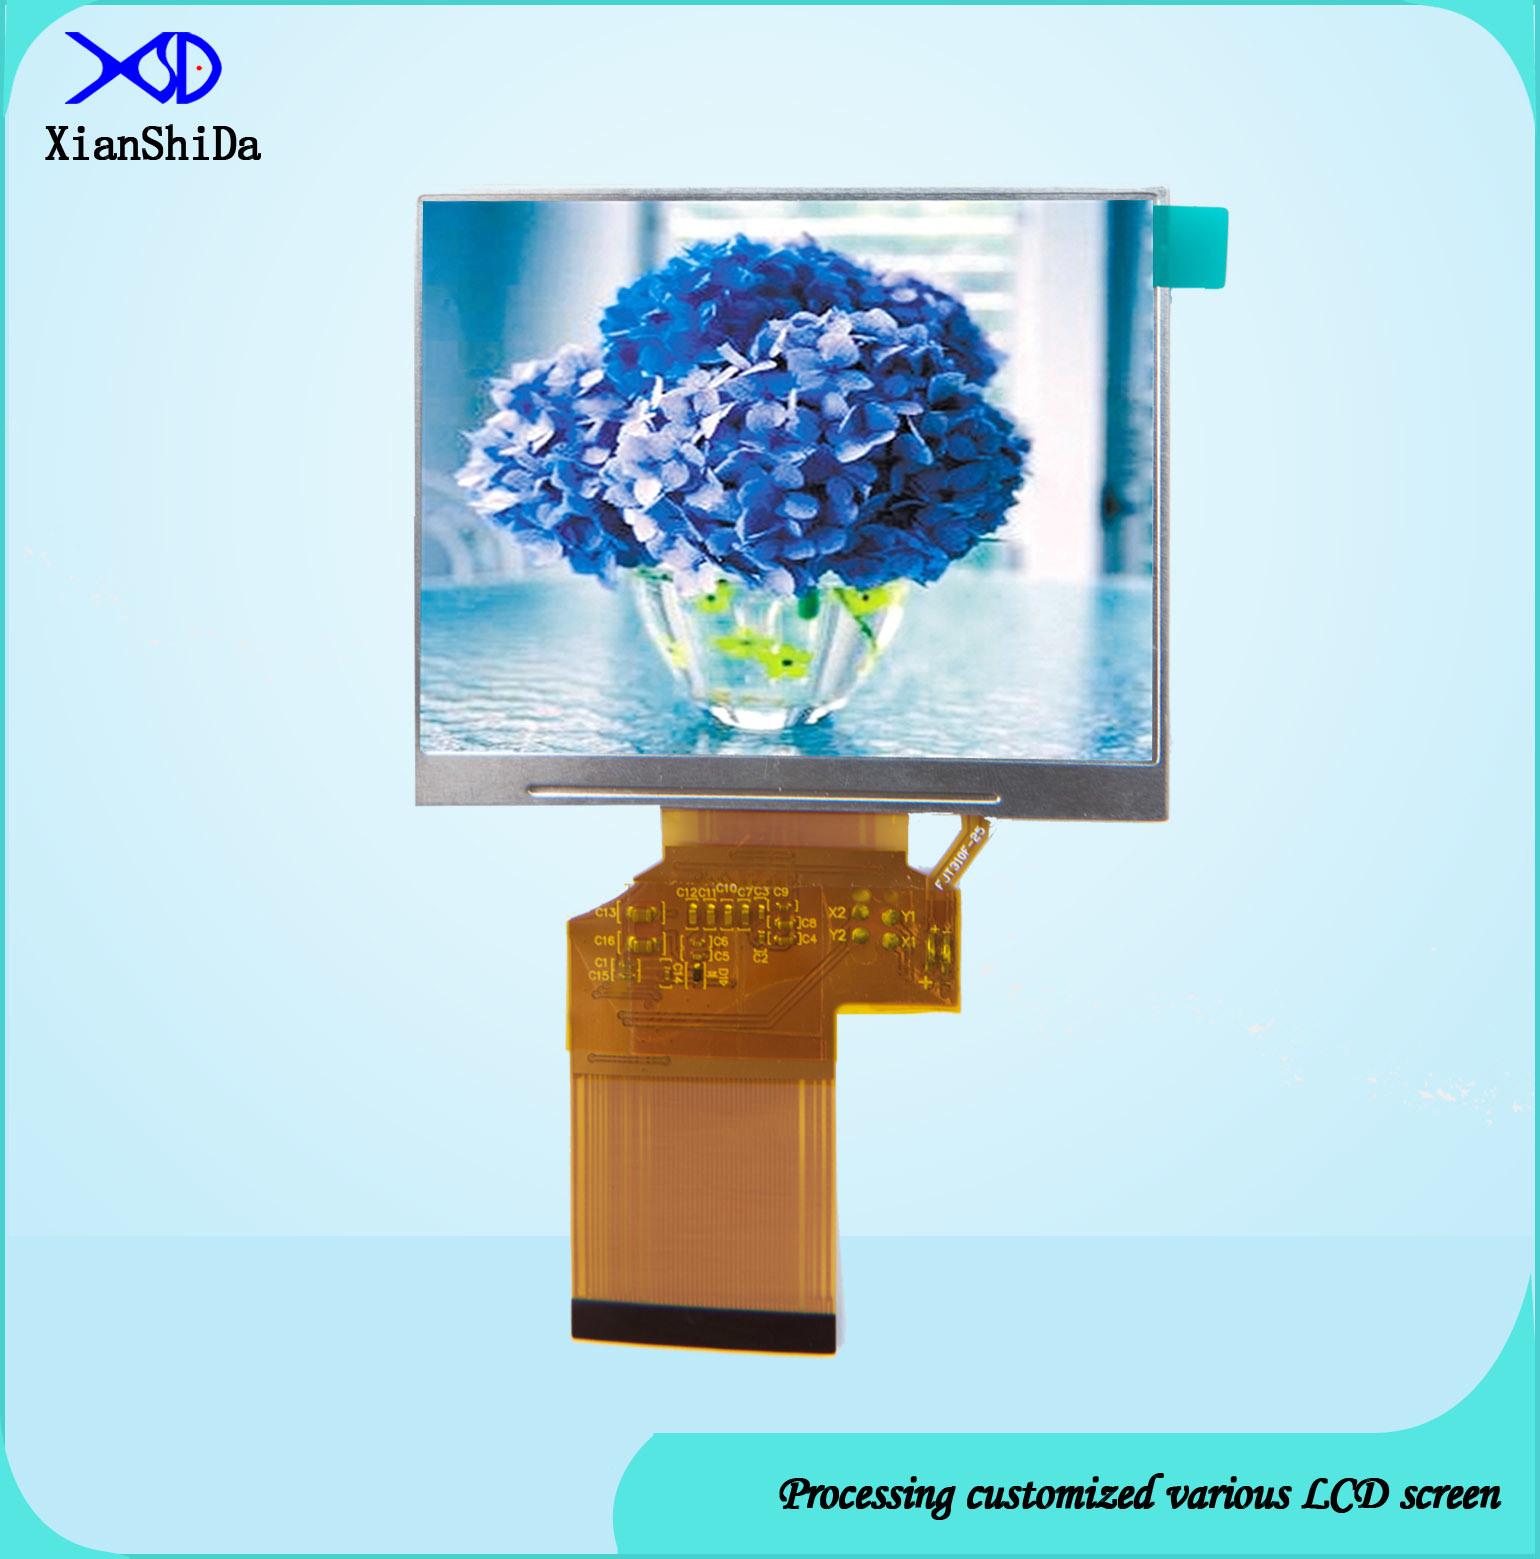 3.5 Inch LCD Screen 780CD/M2 High Luminance TFT LCD Display for White Goods